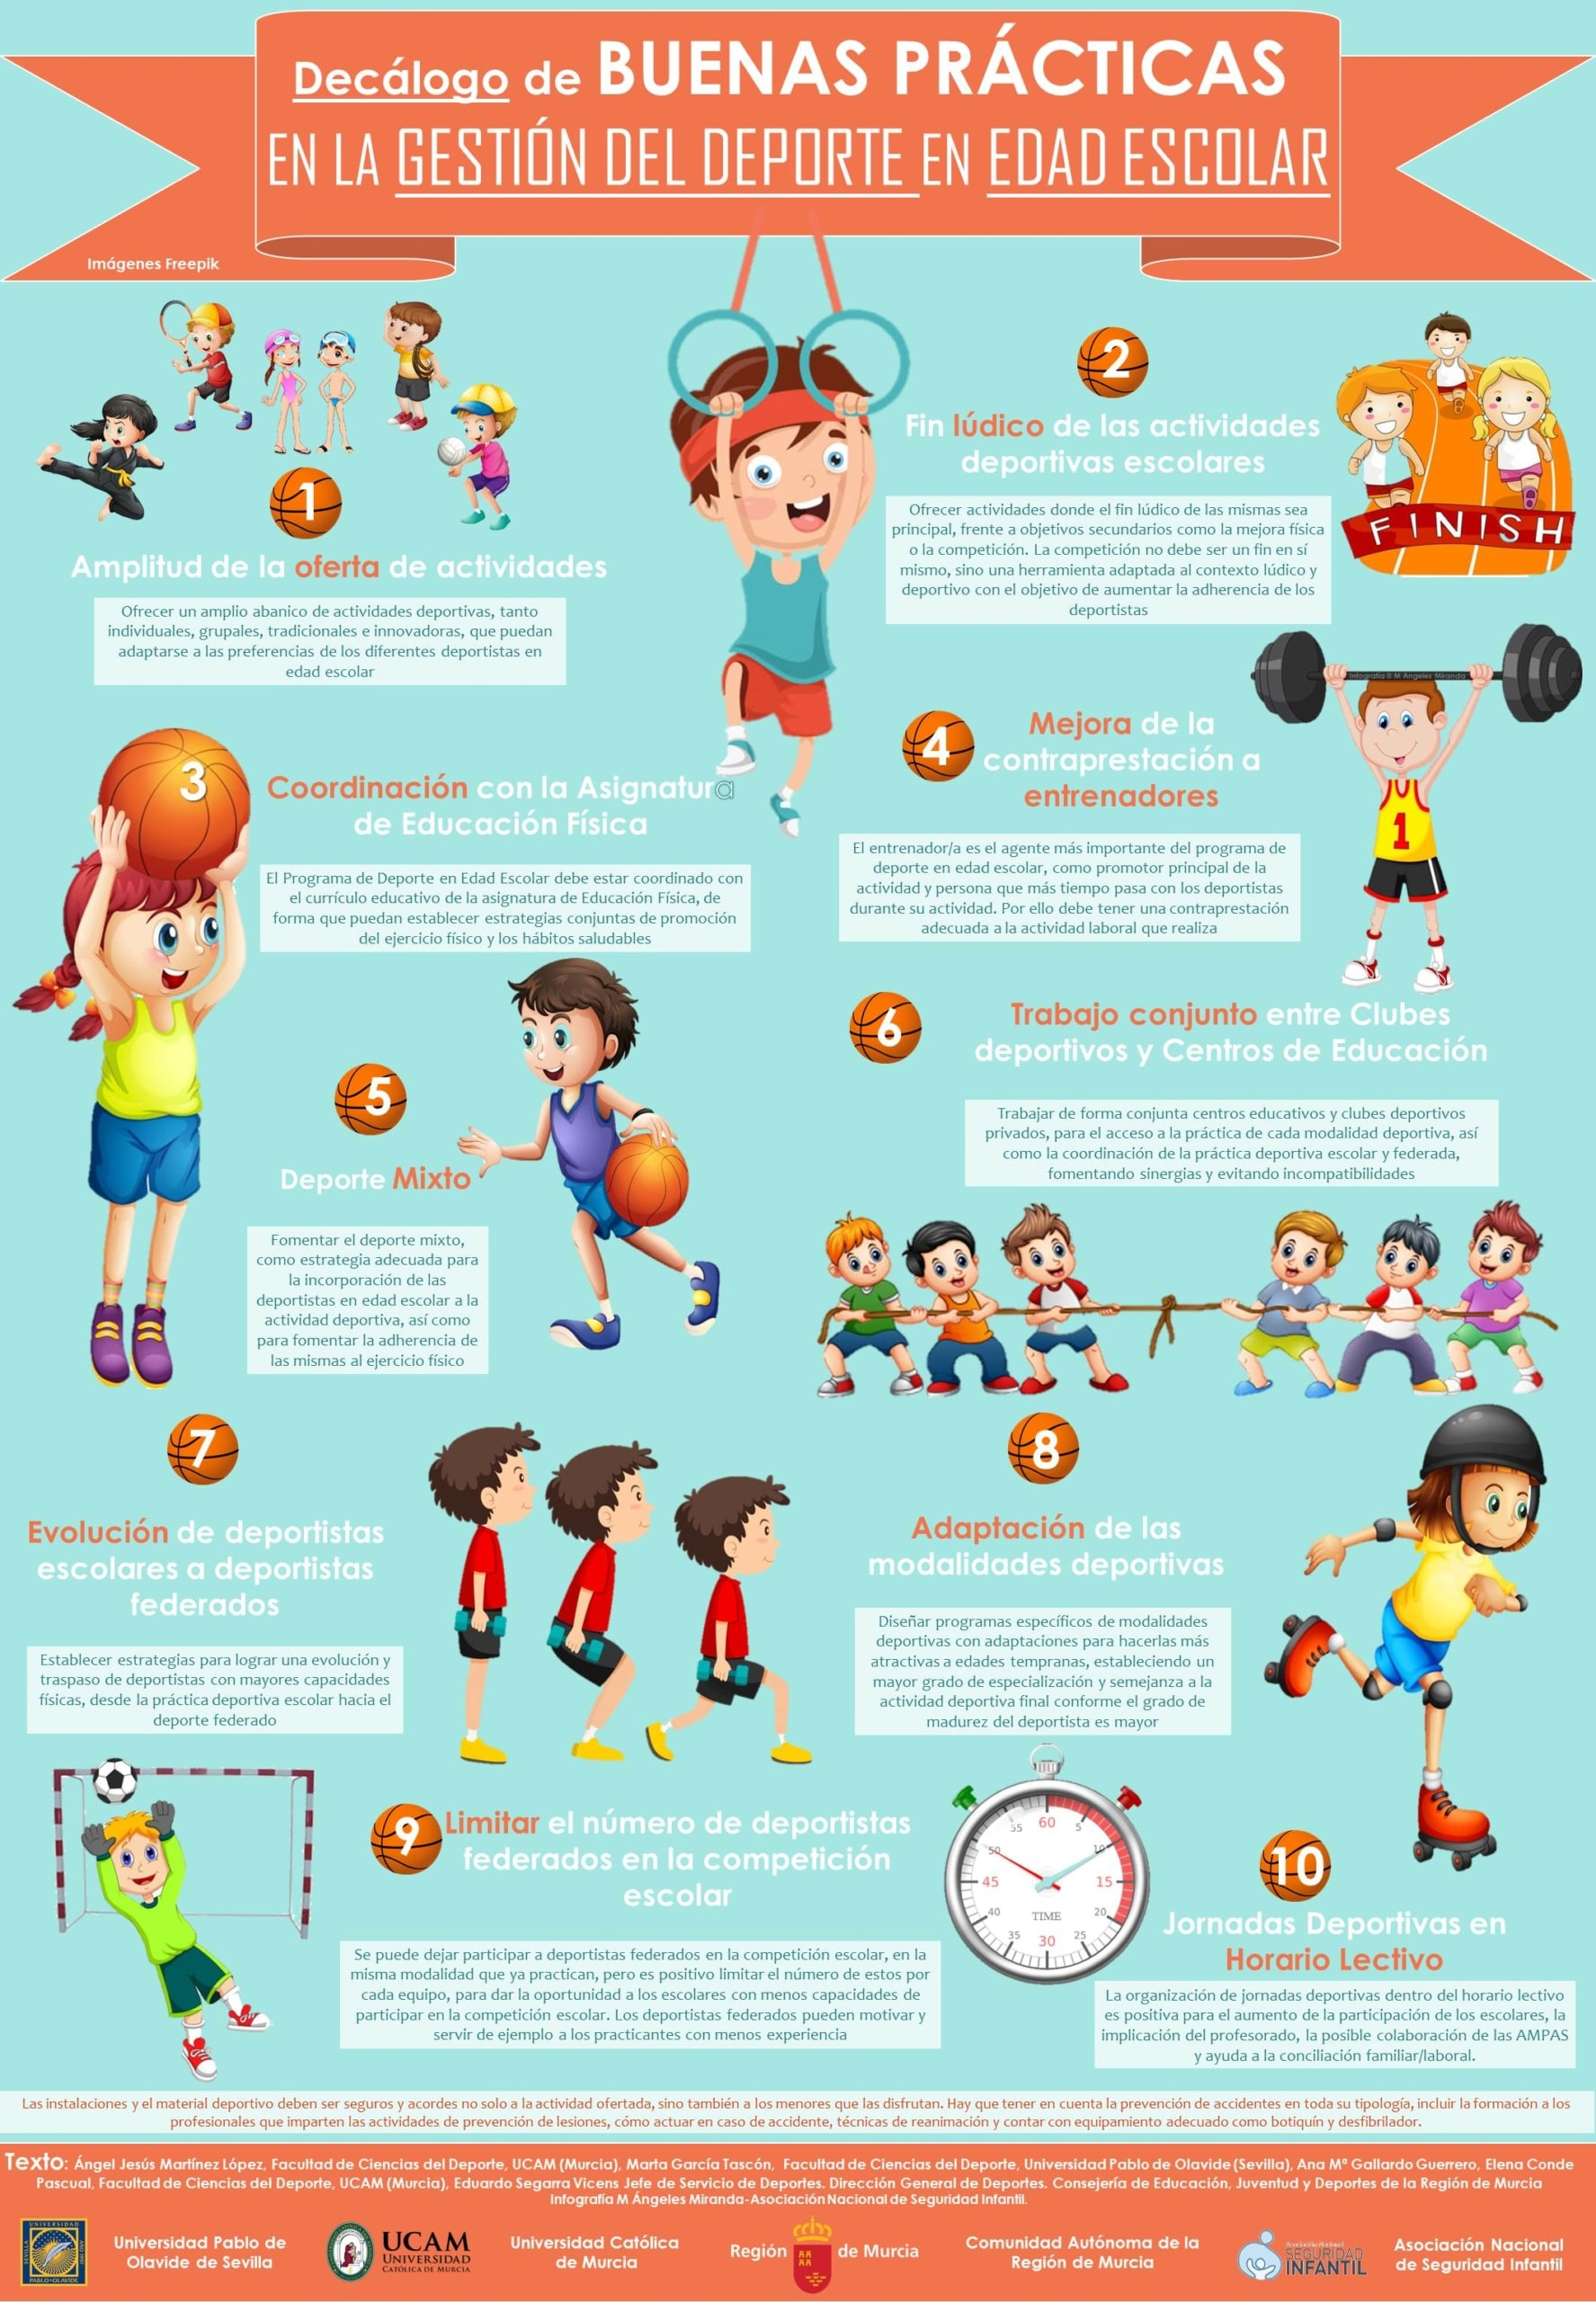 gestion-deporte-escolar